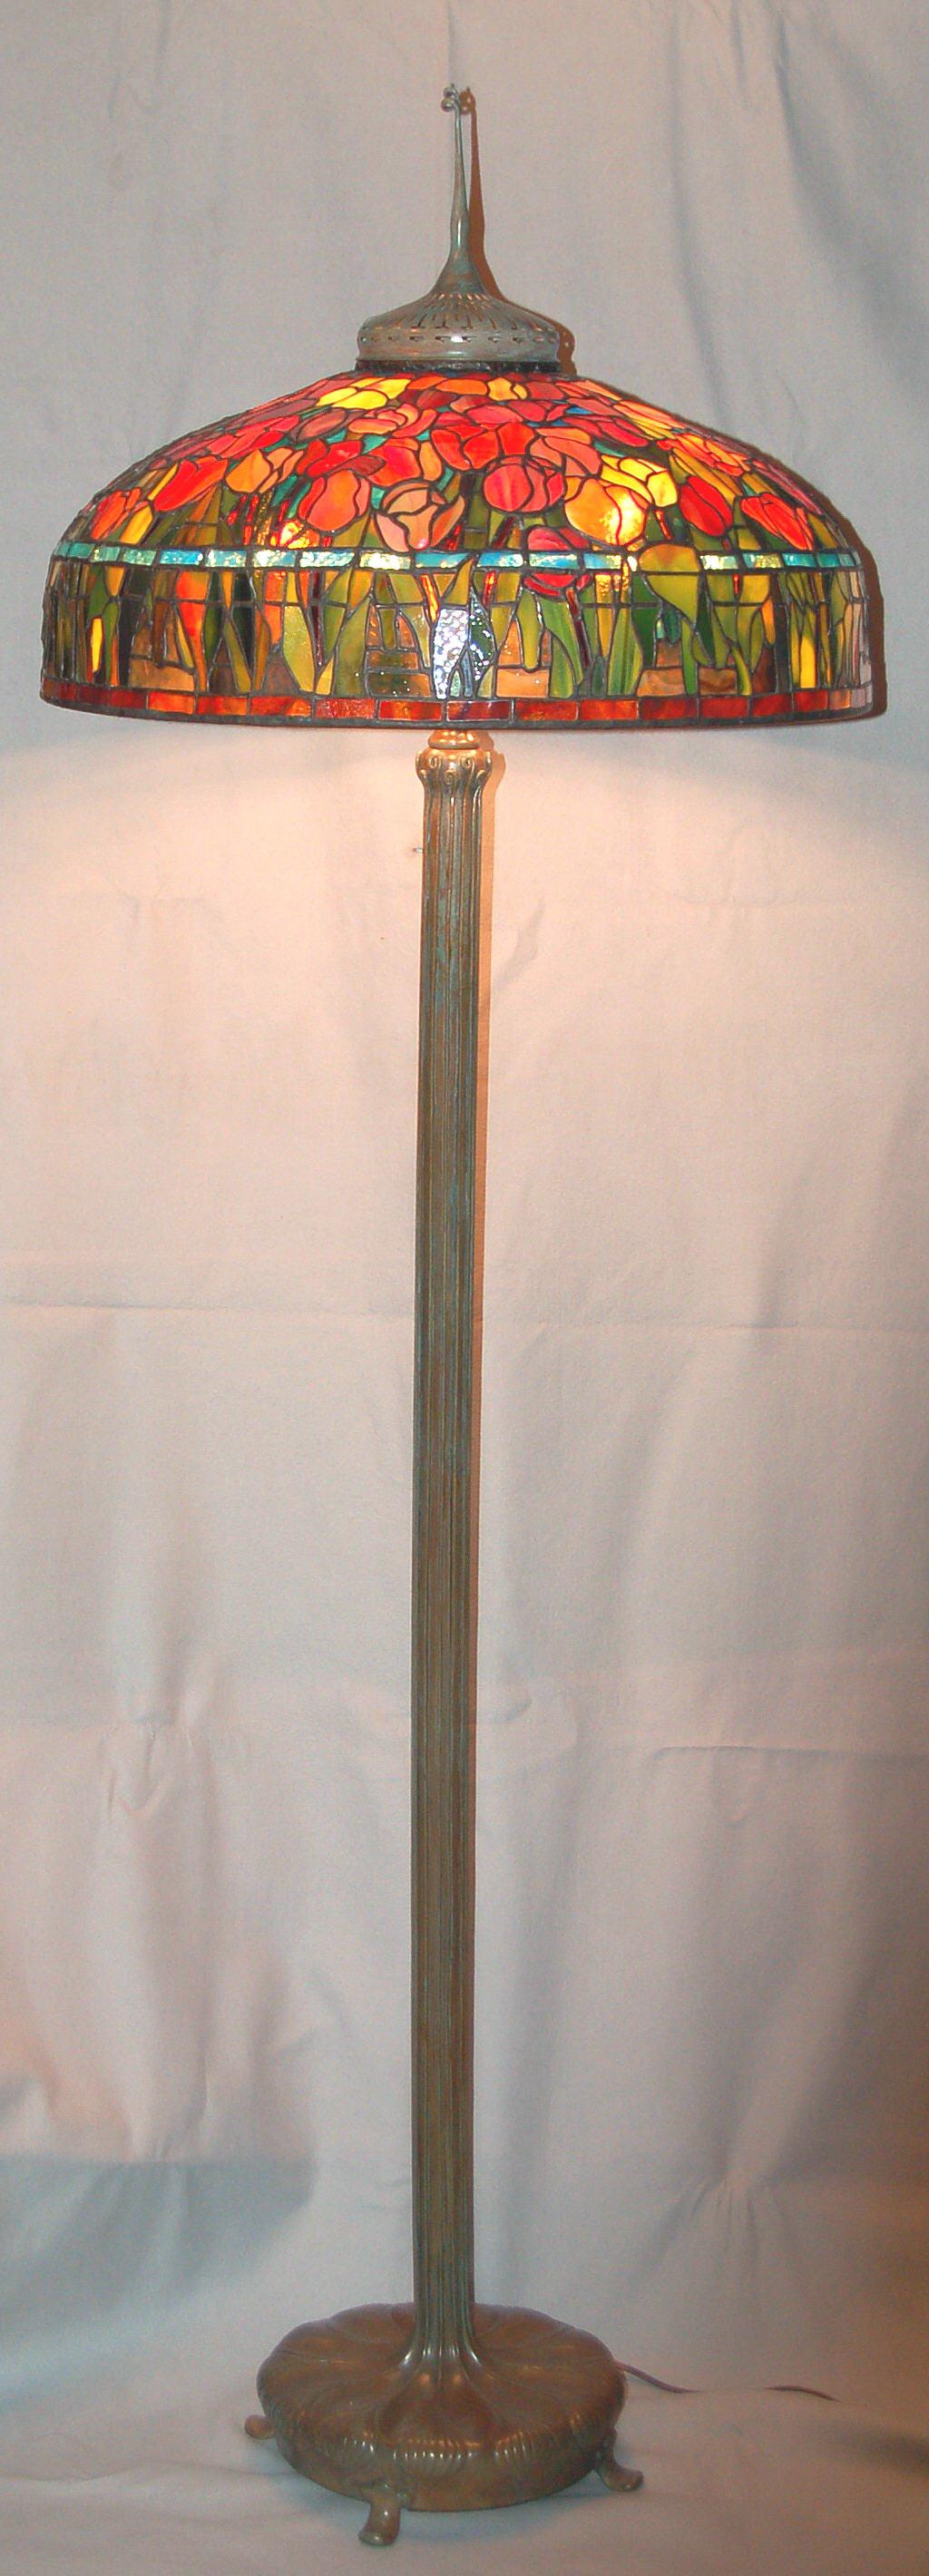 Patty DeGroodt 22 inch Tulip 2007 full shot.jpg